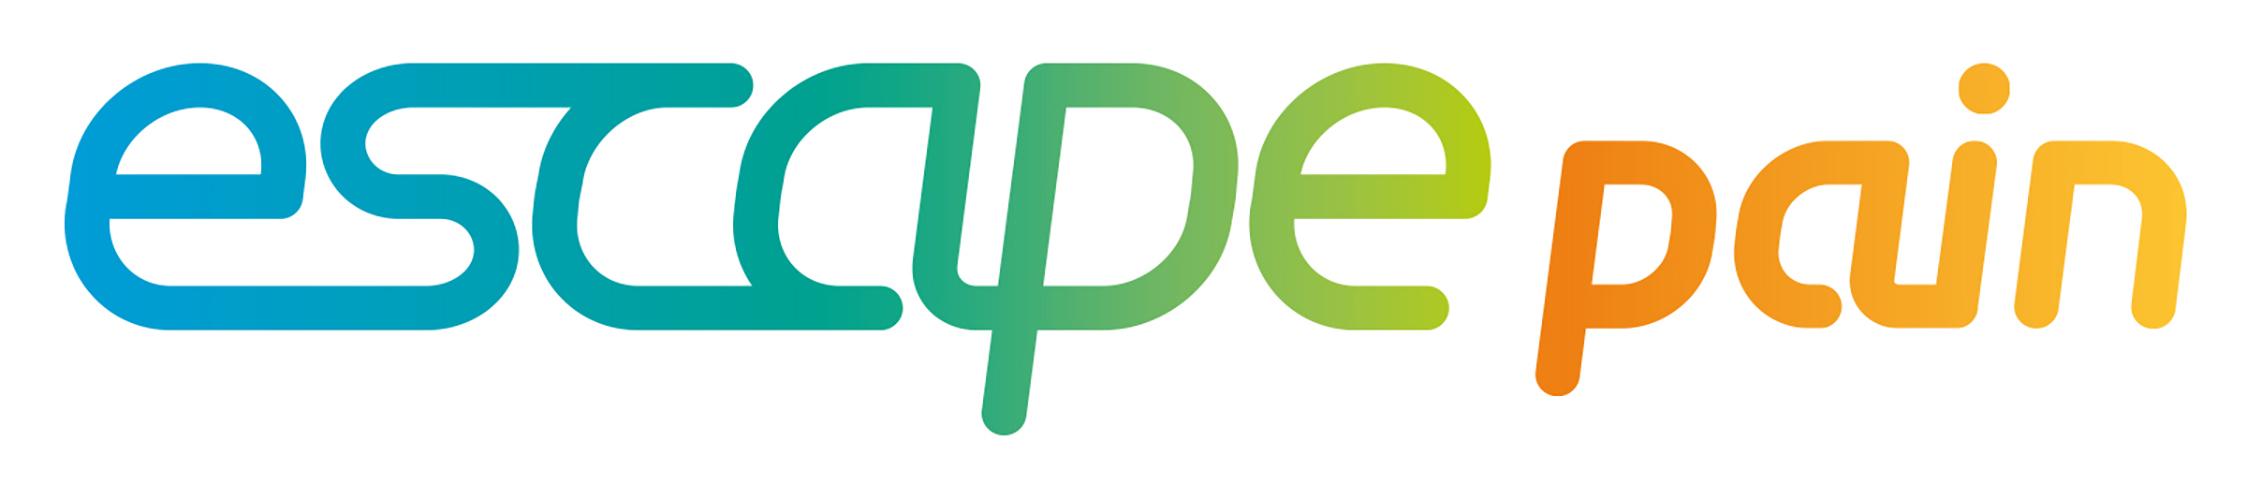 ESCAPE logo 2247x500px